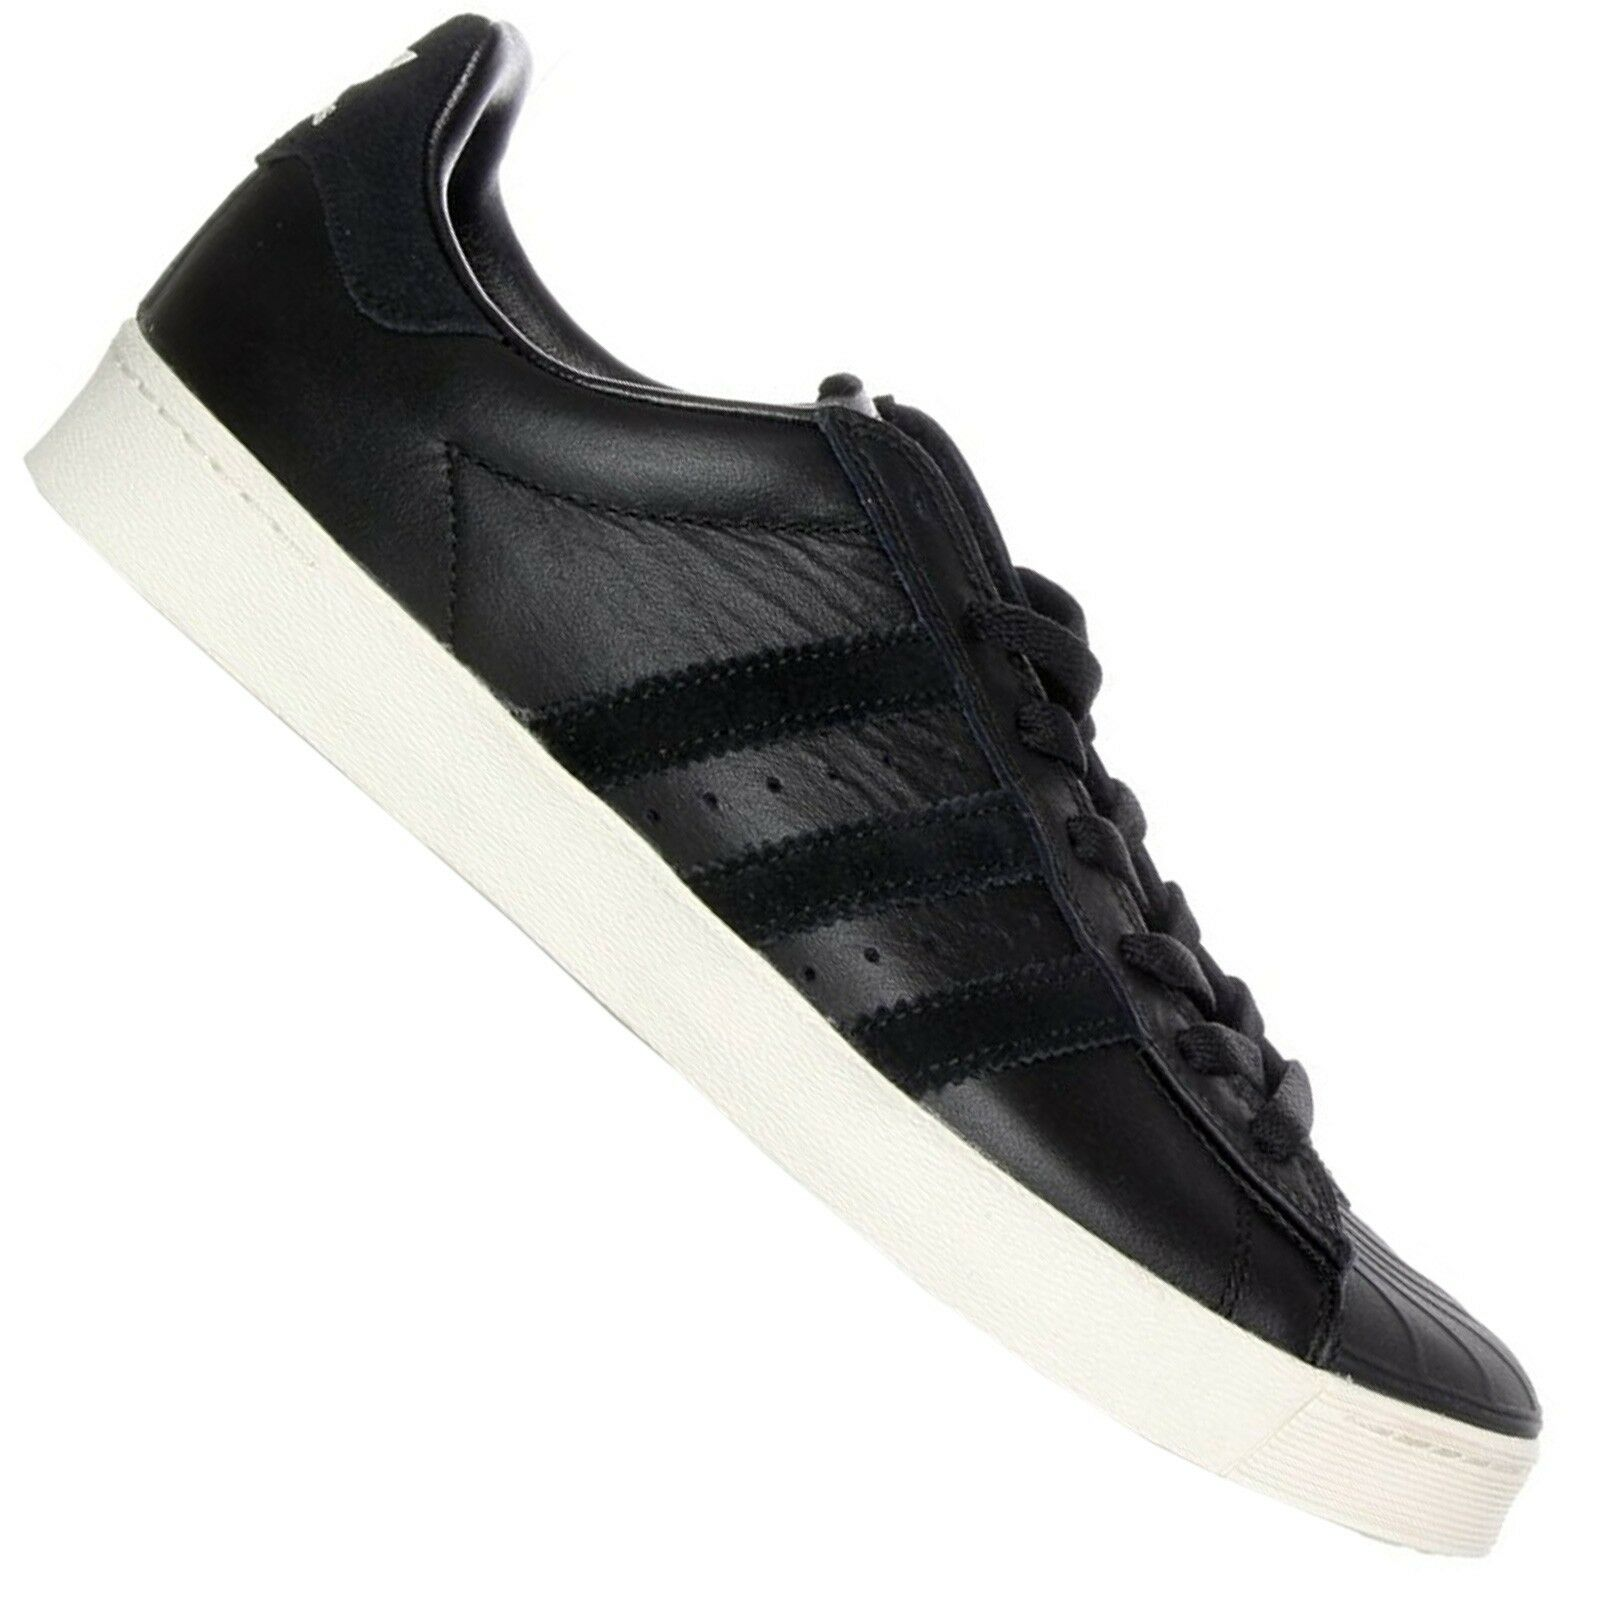 Adidas Originals Superstar Vulc Adv shoes Sneaker pelle black Classici